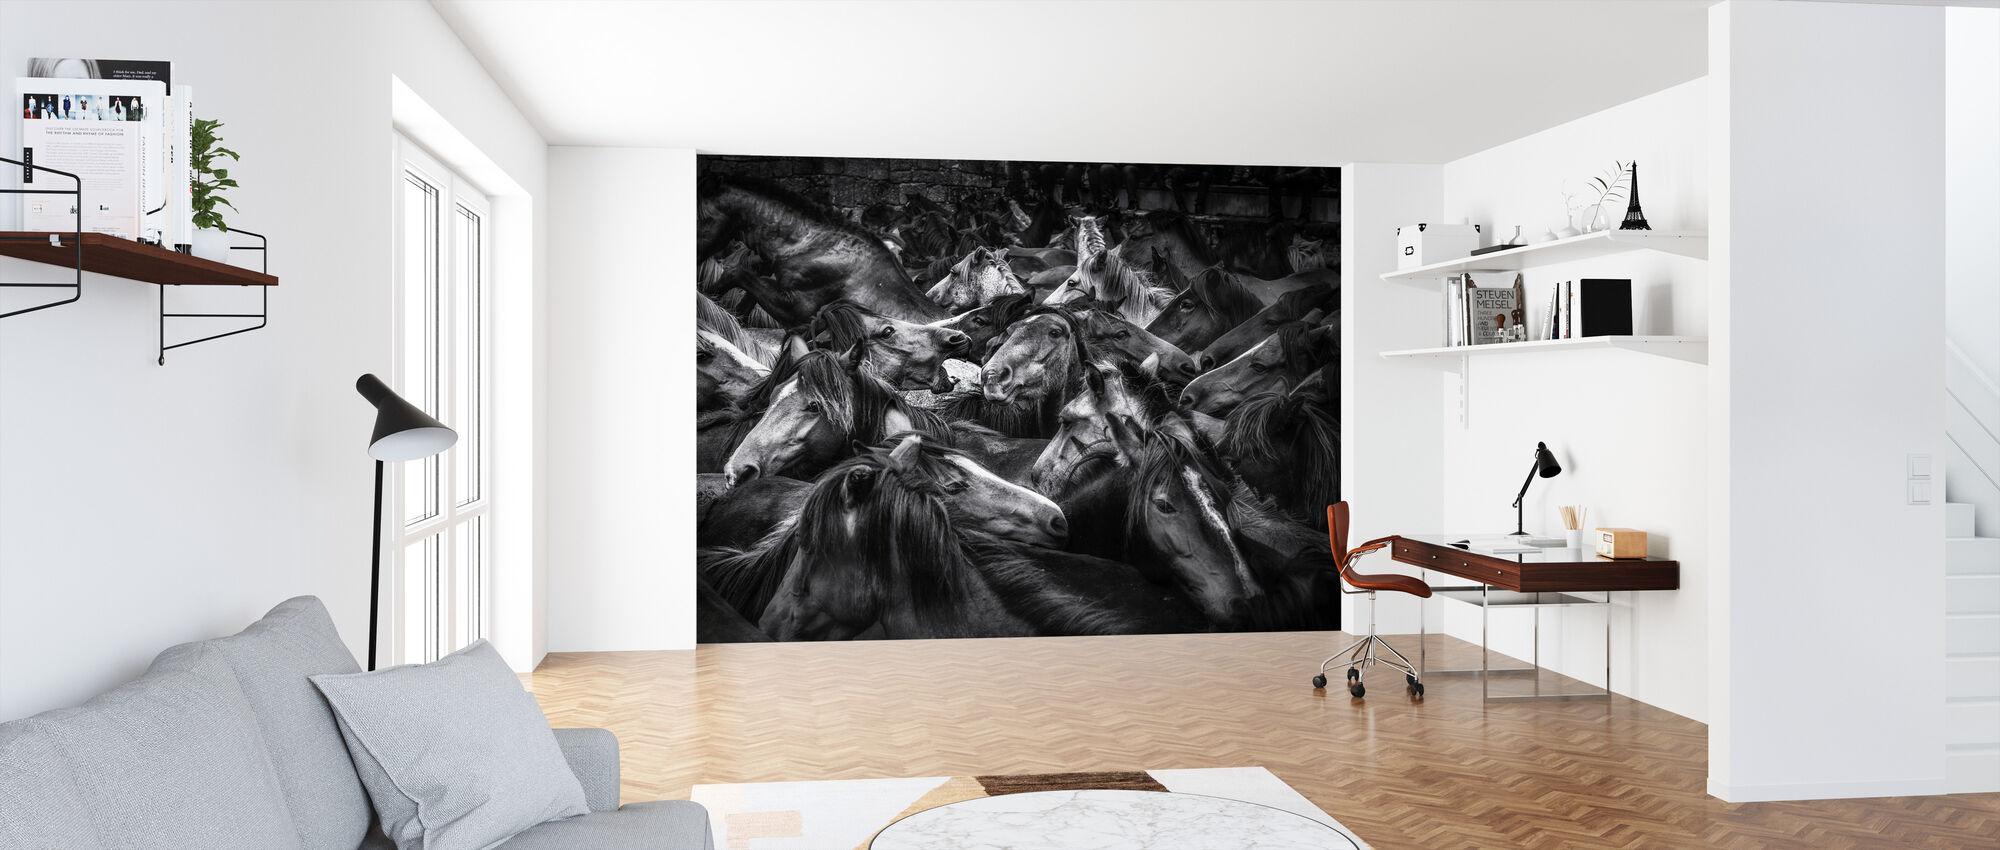 Cornered - Wallpaper - Office